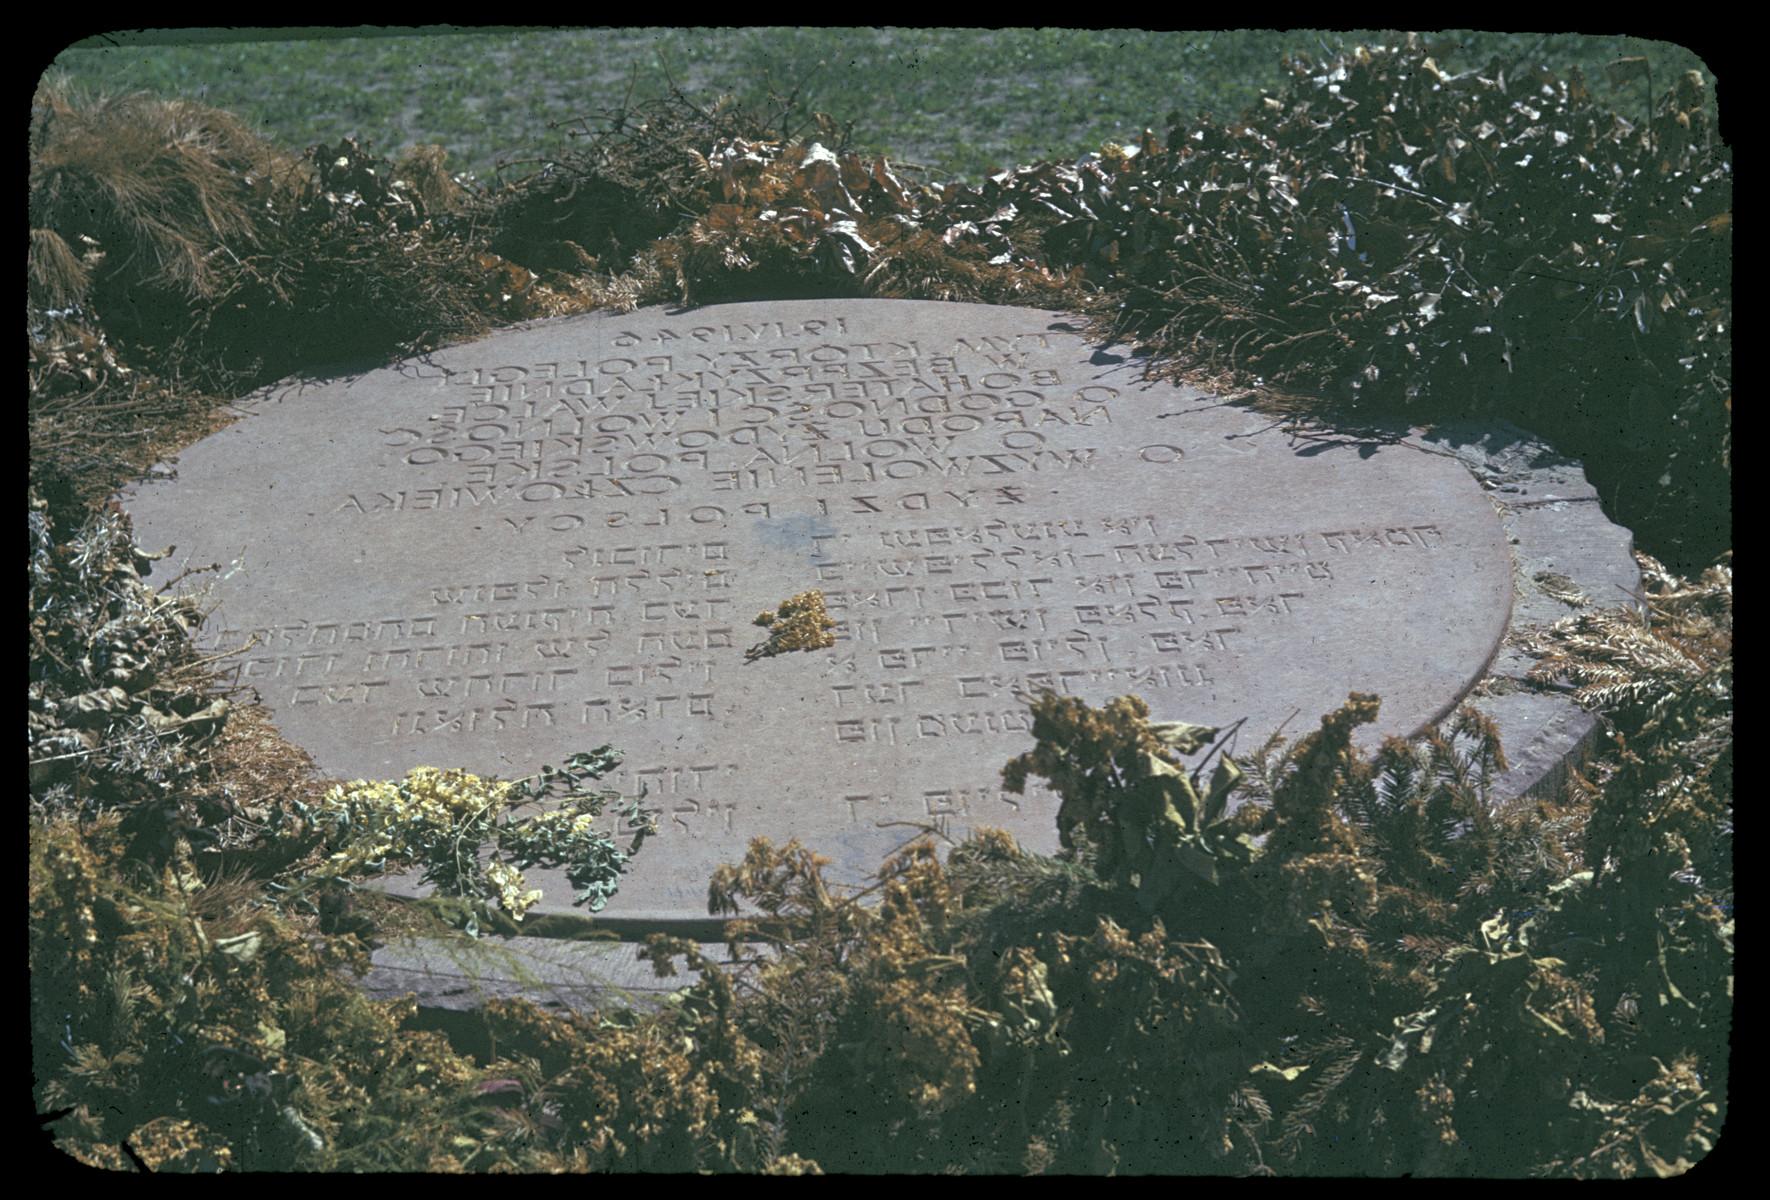 Memorial to the dead in the Warsaw ghetto.